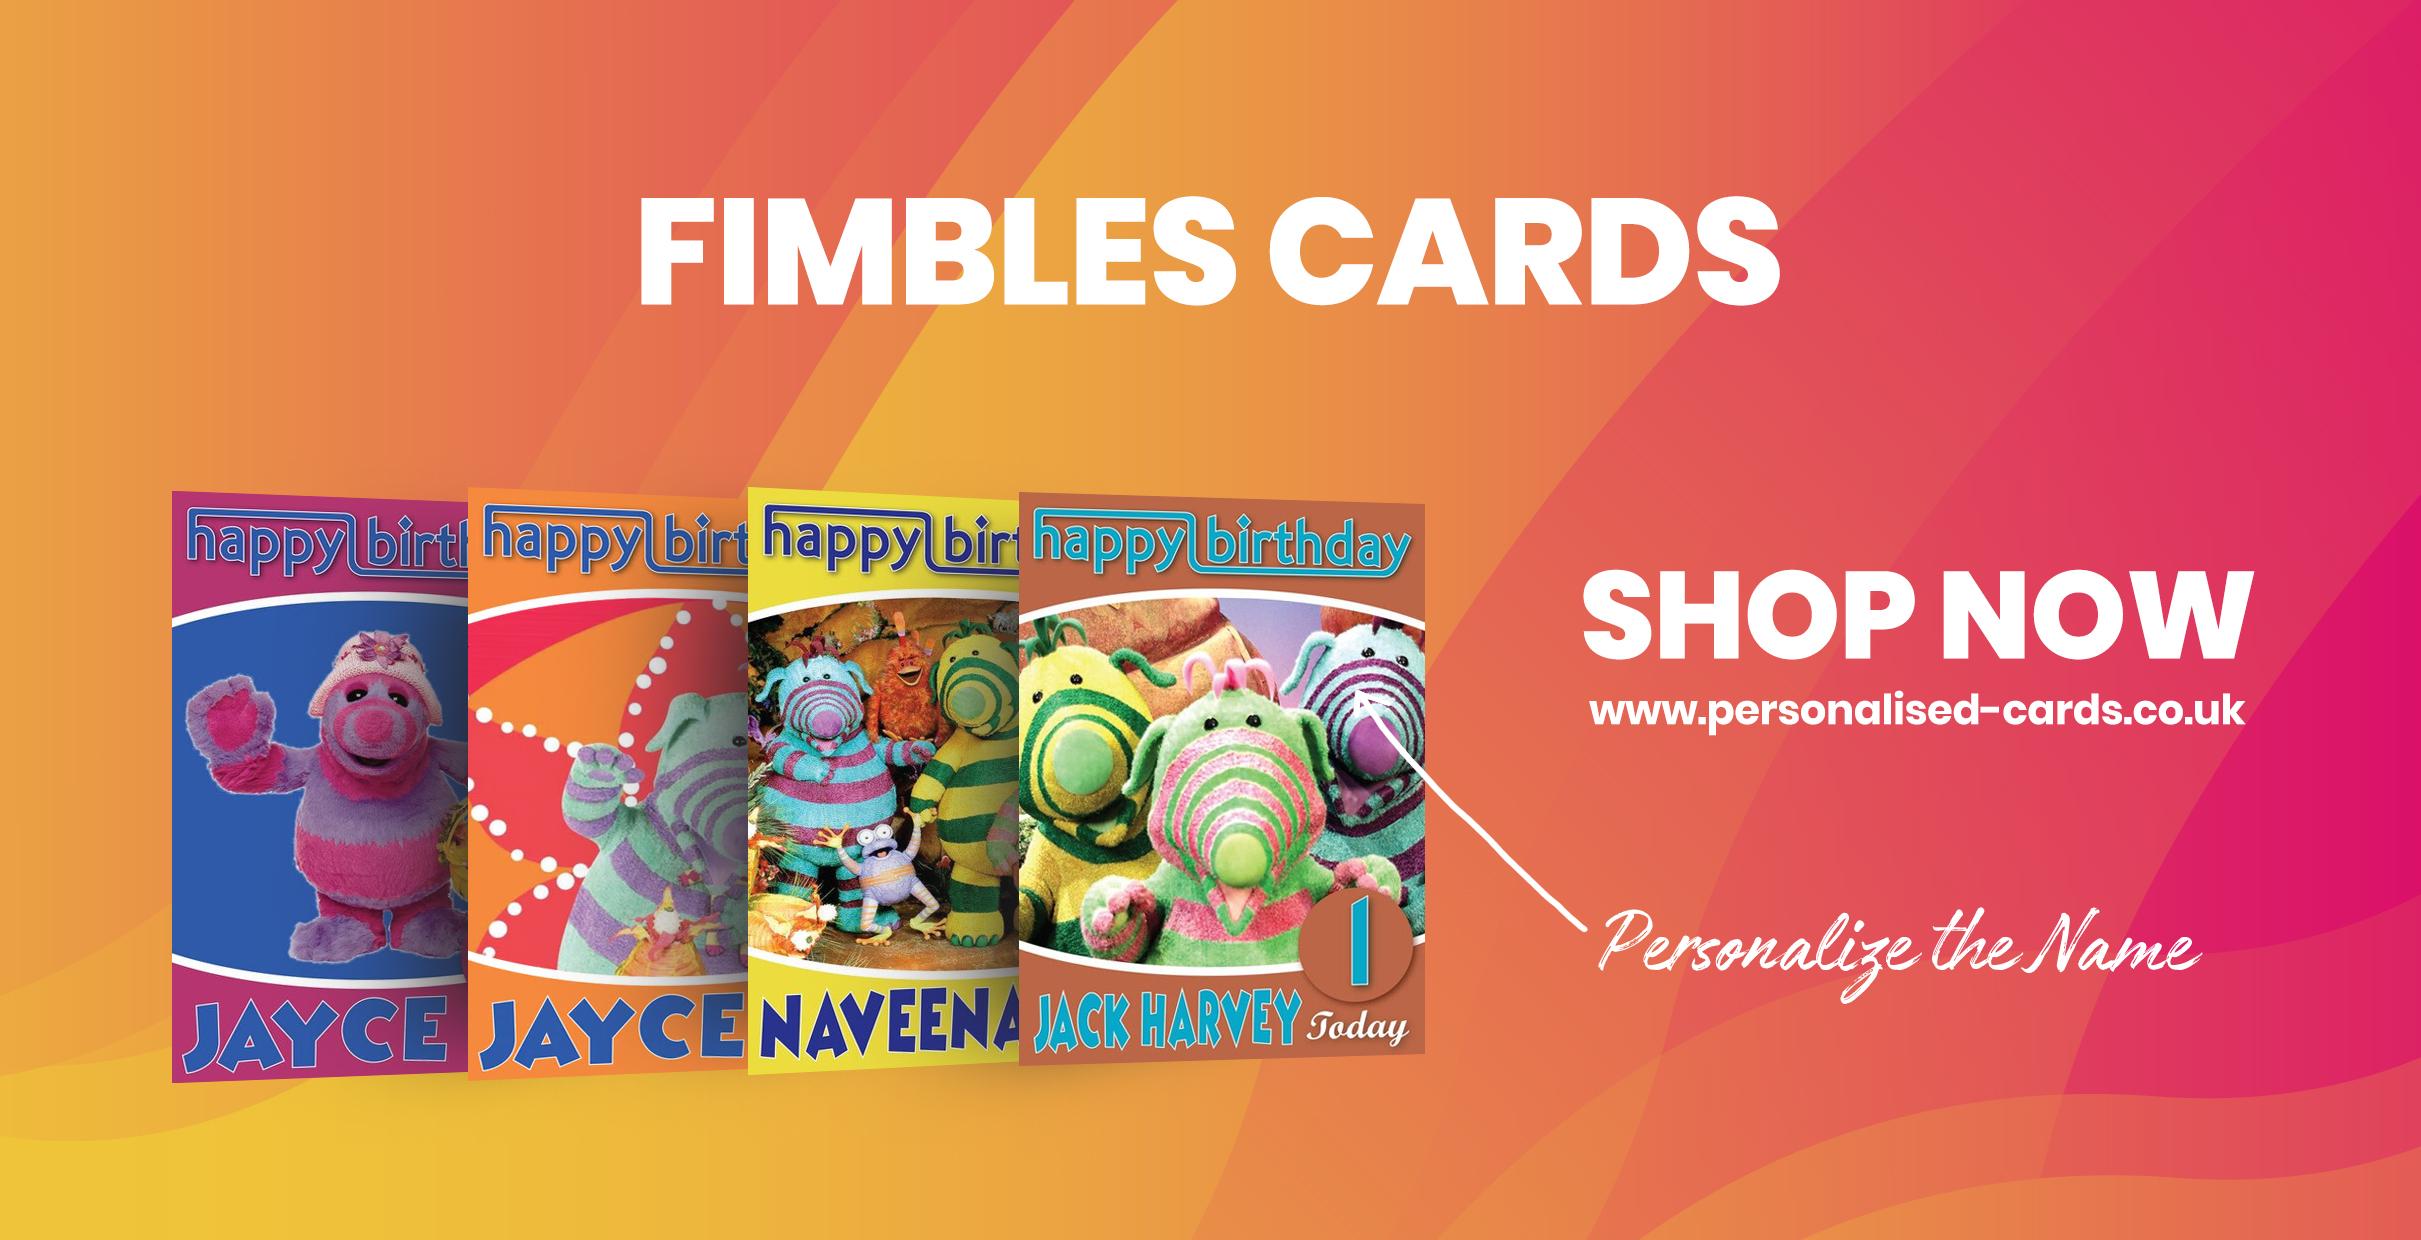 fimbles-cards.jpg